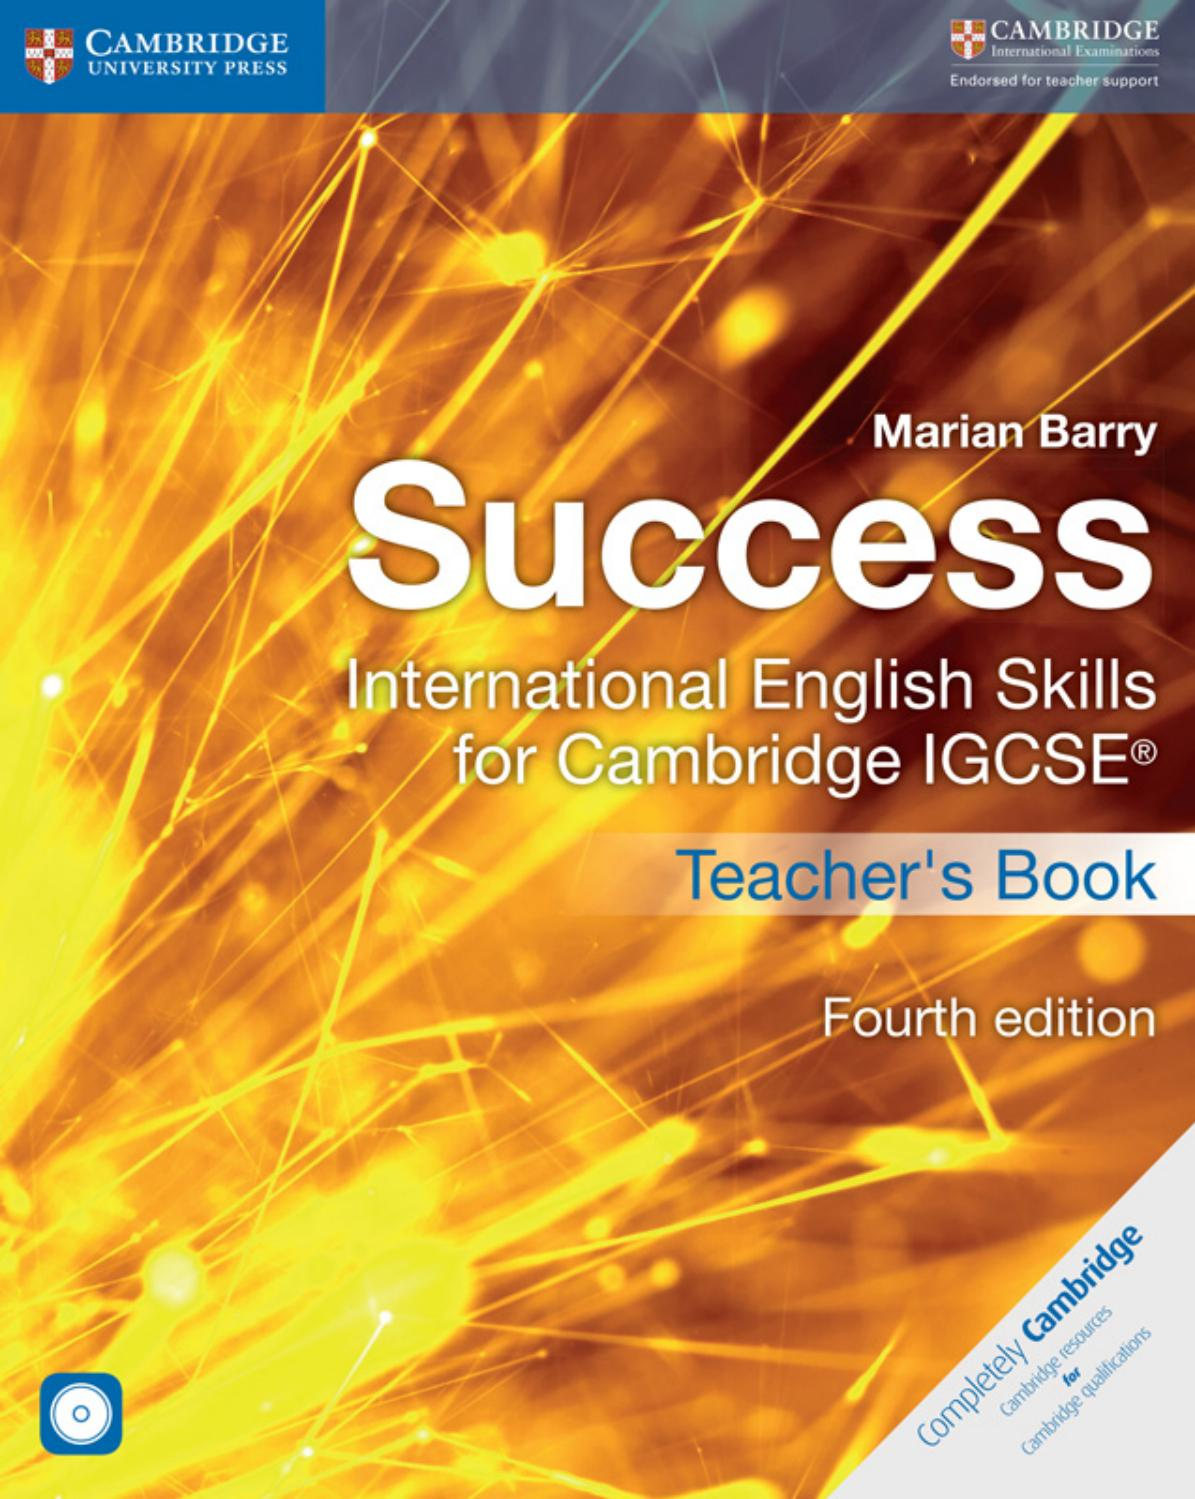 Preview Success - International English Skills for Cambridge IGCSE® Teacher's  Book by Cambridge University Press Education - issuu